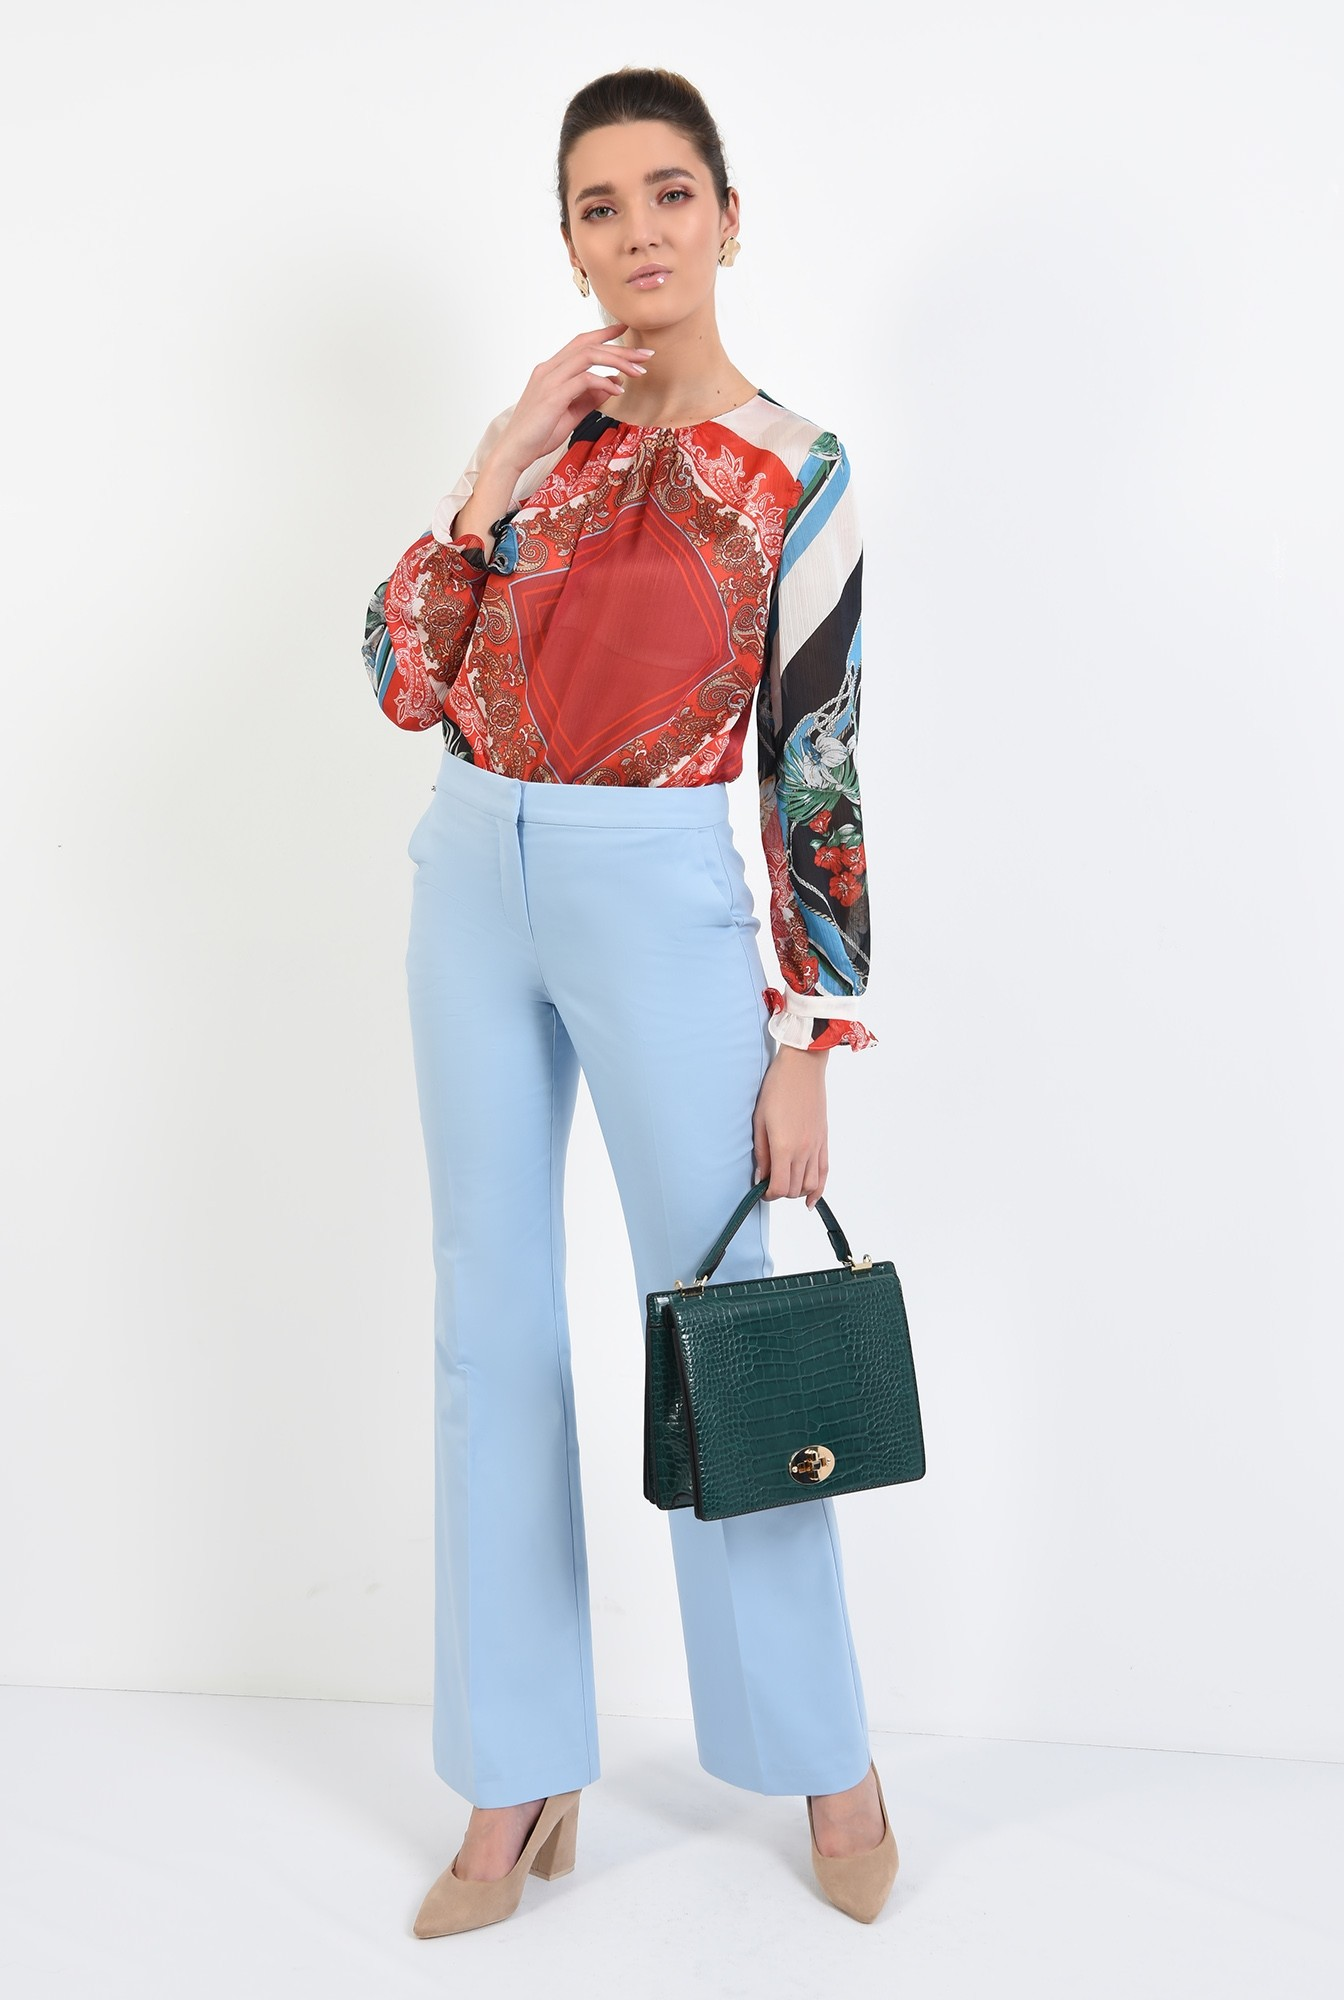 0 - pantaloni casual, din bumbac, drepti, cu buzunare